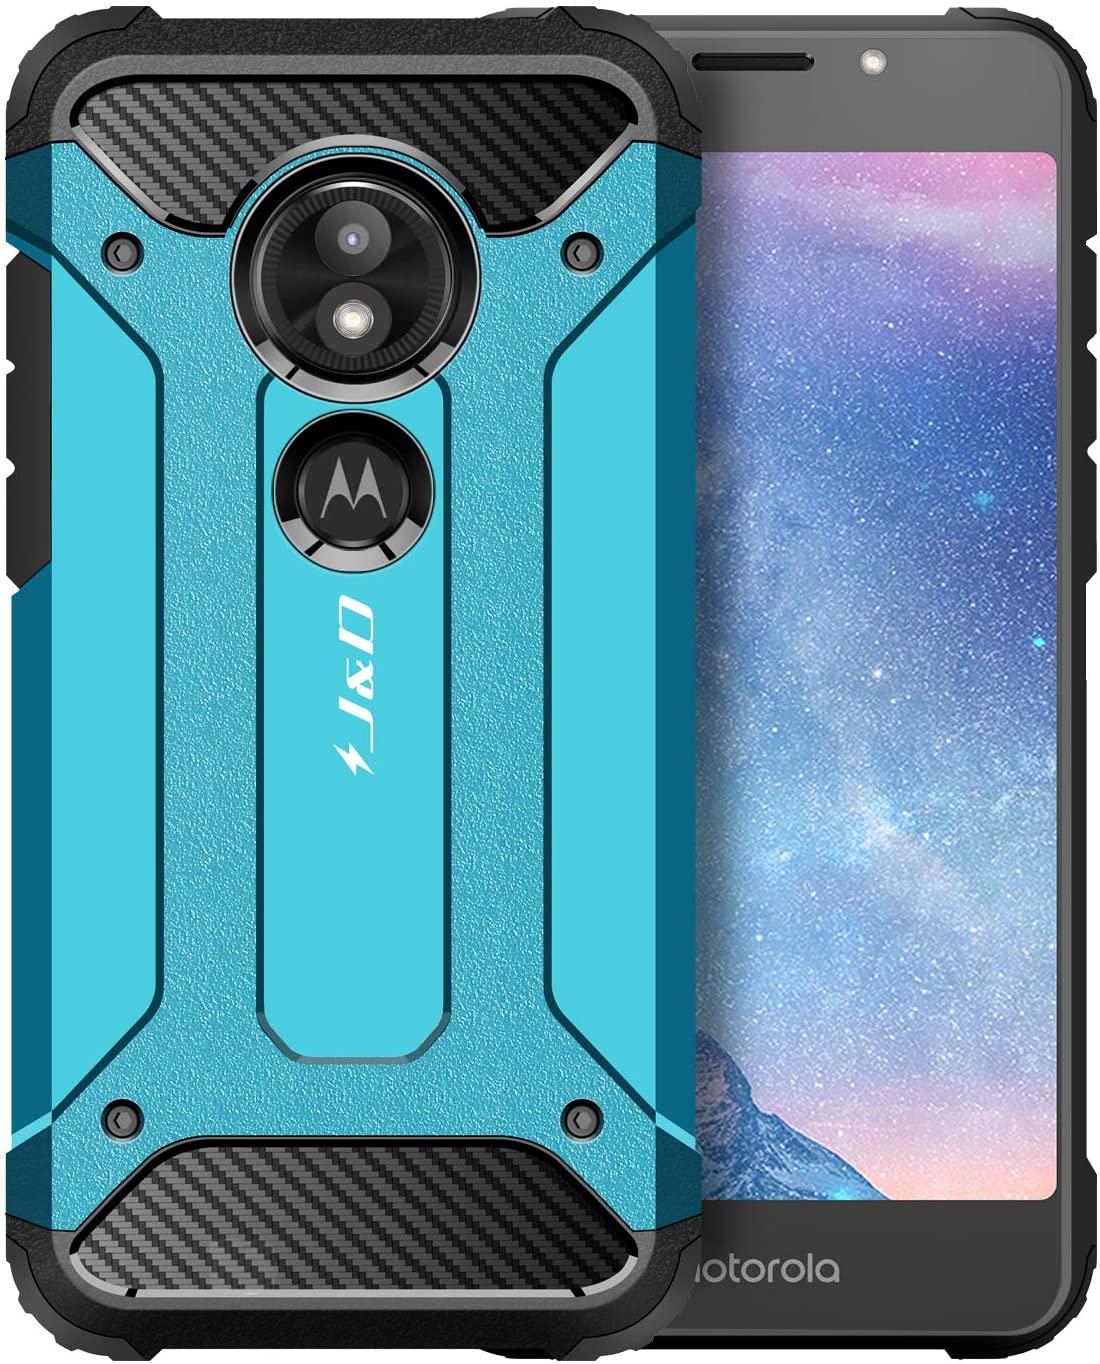 Moto E5 Play Case, Moto E5 Cruise case, [Kickstand/Wrist